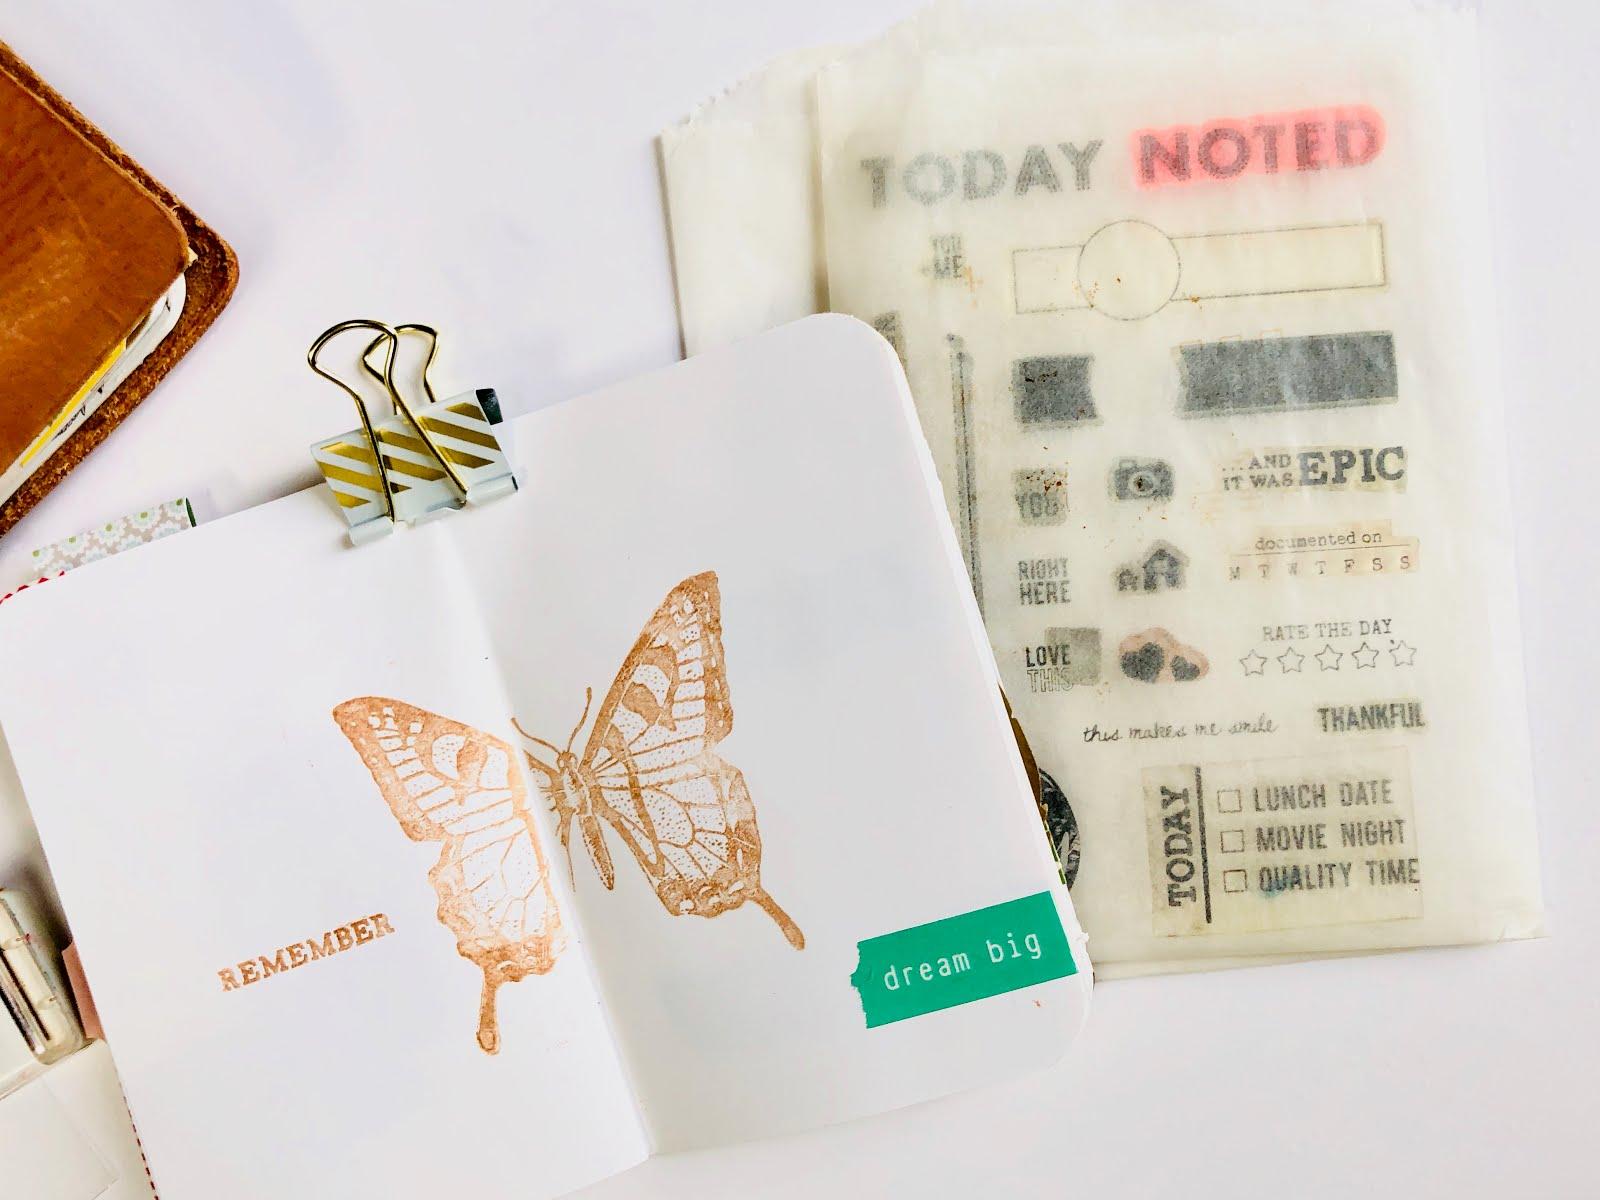 #Travelers Notebook #Gratitude Journal #journaling #Midori #Planner #notebook #thankfulness #gratitude #grateful #art journal #art journaling #stamping